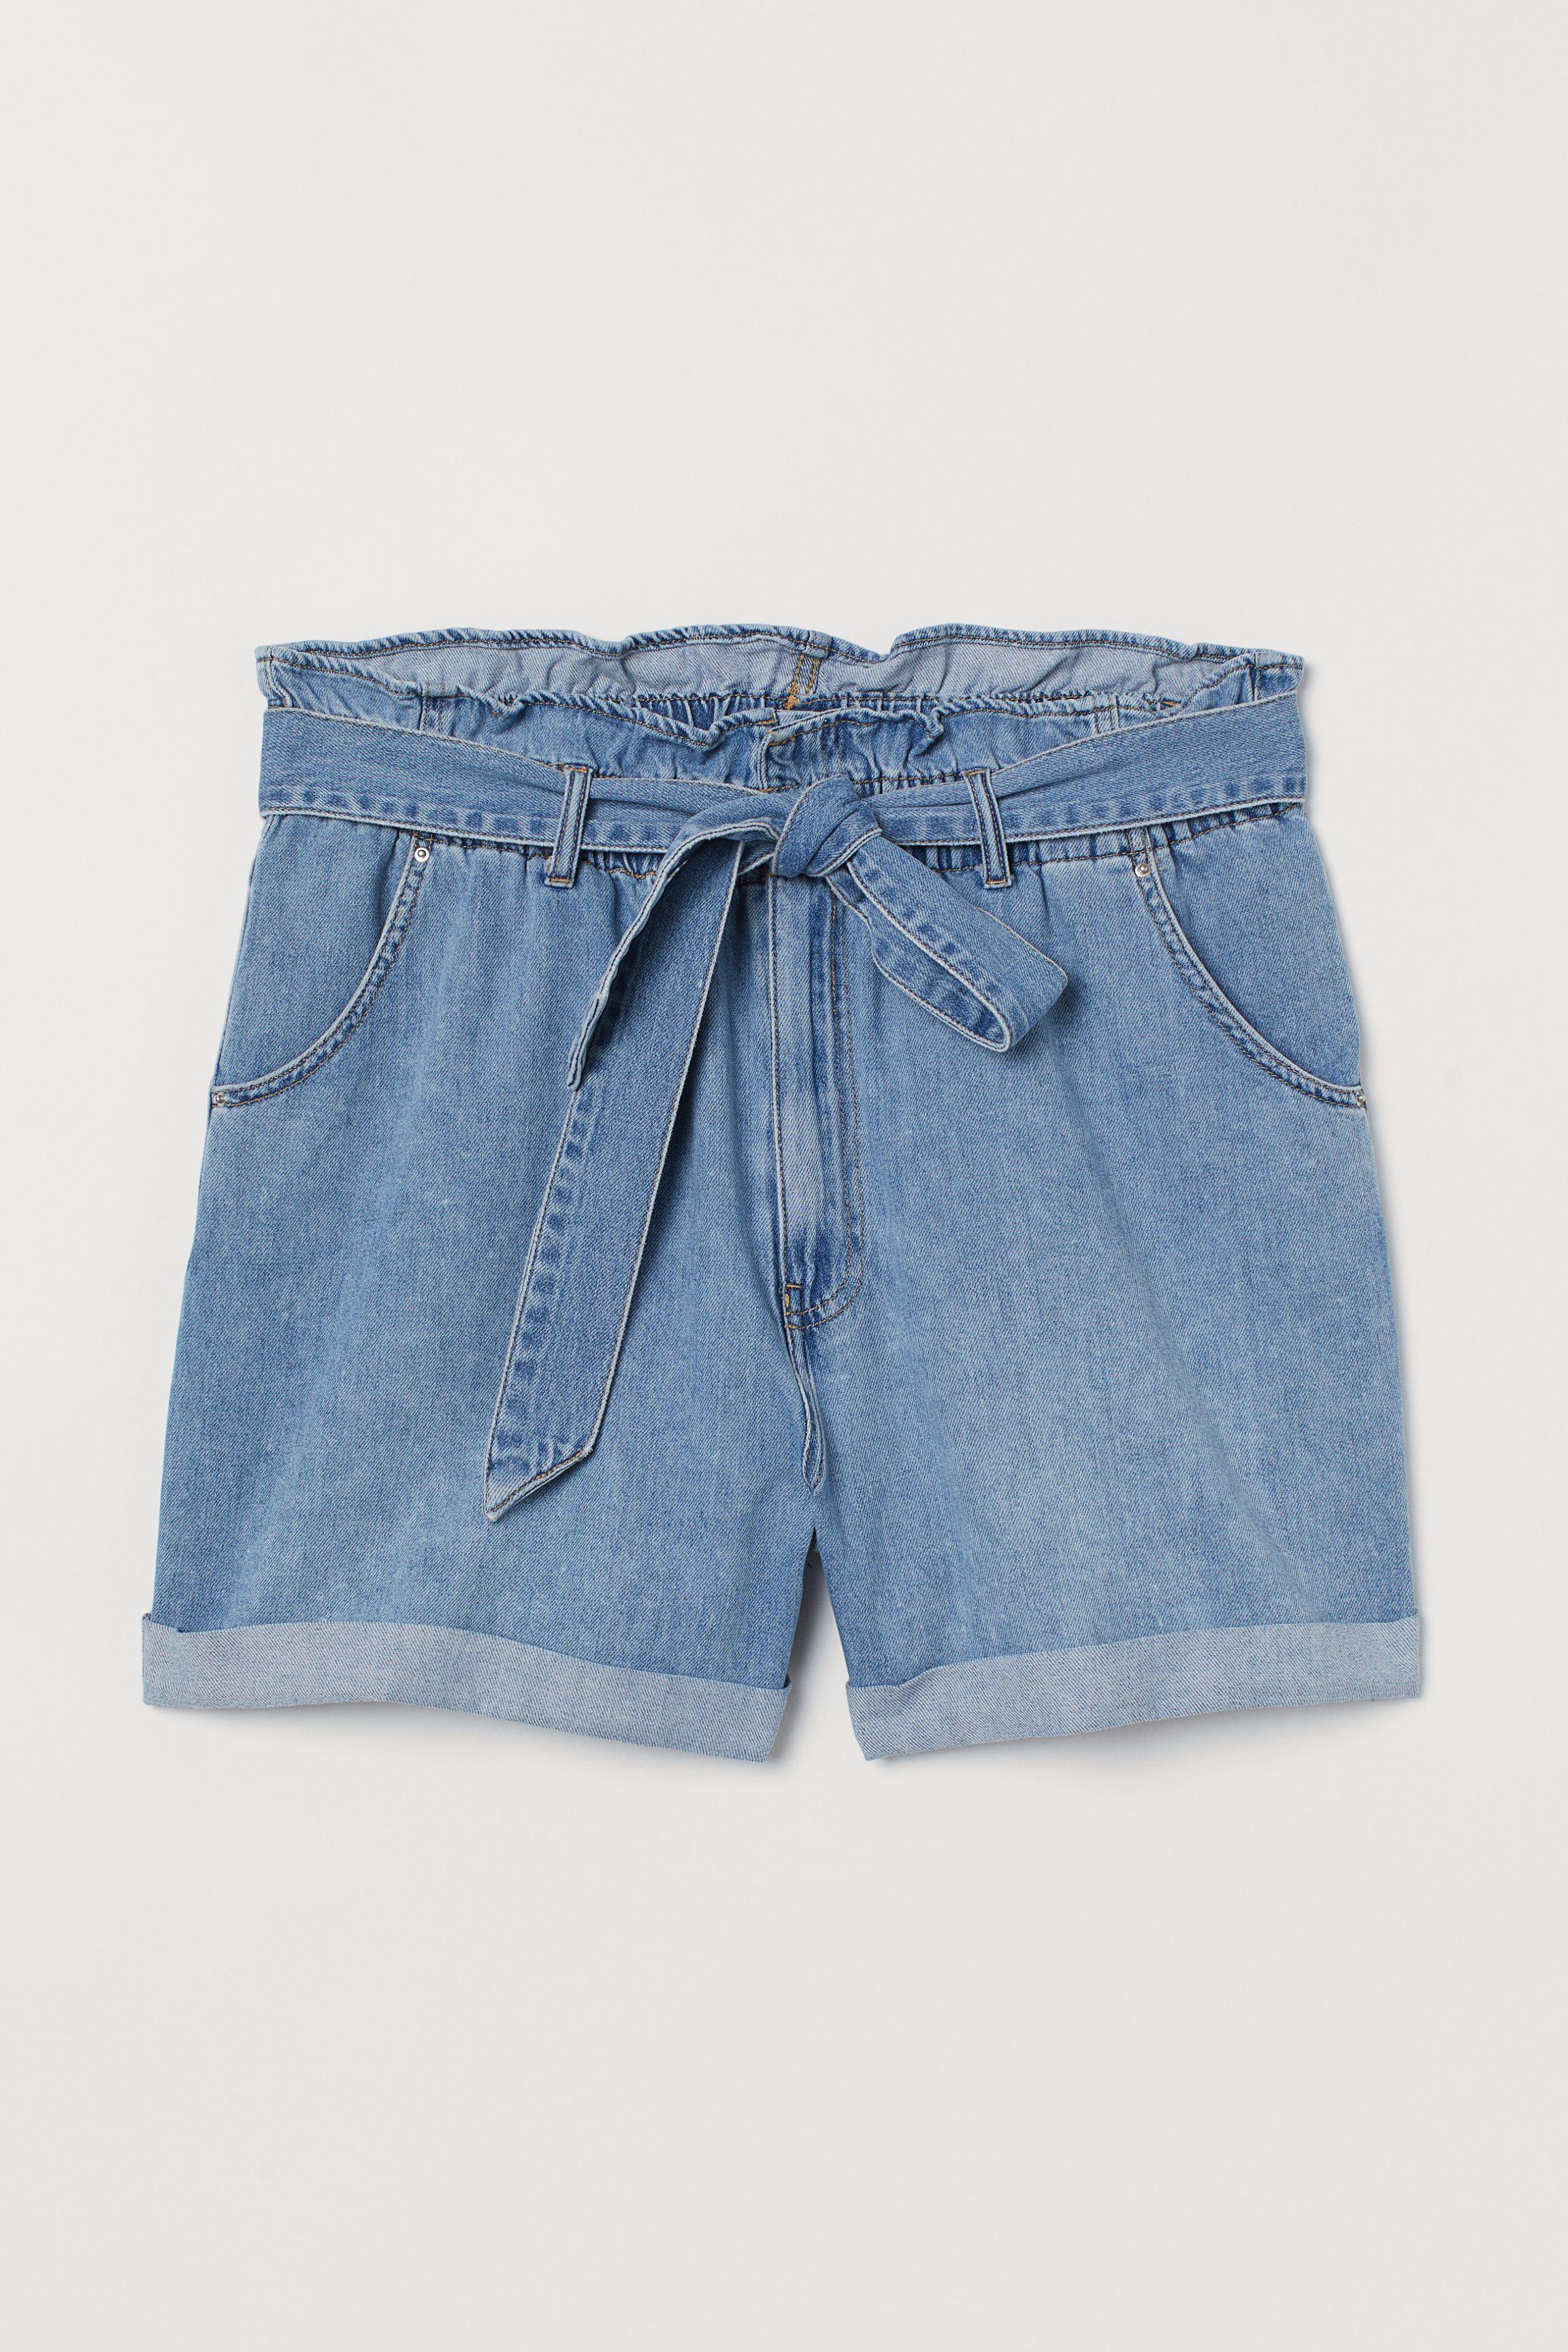 H&M+ Denim Paper-bag Shorts